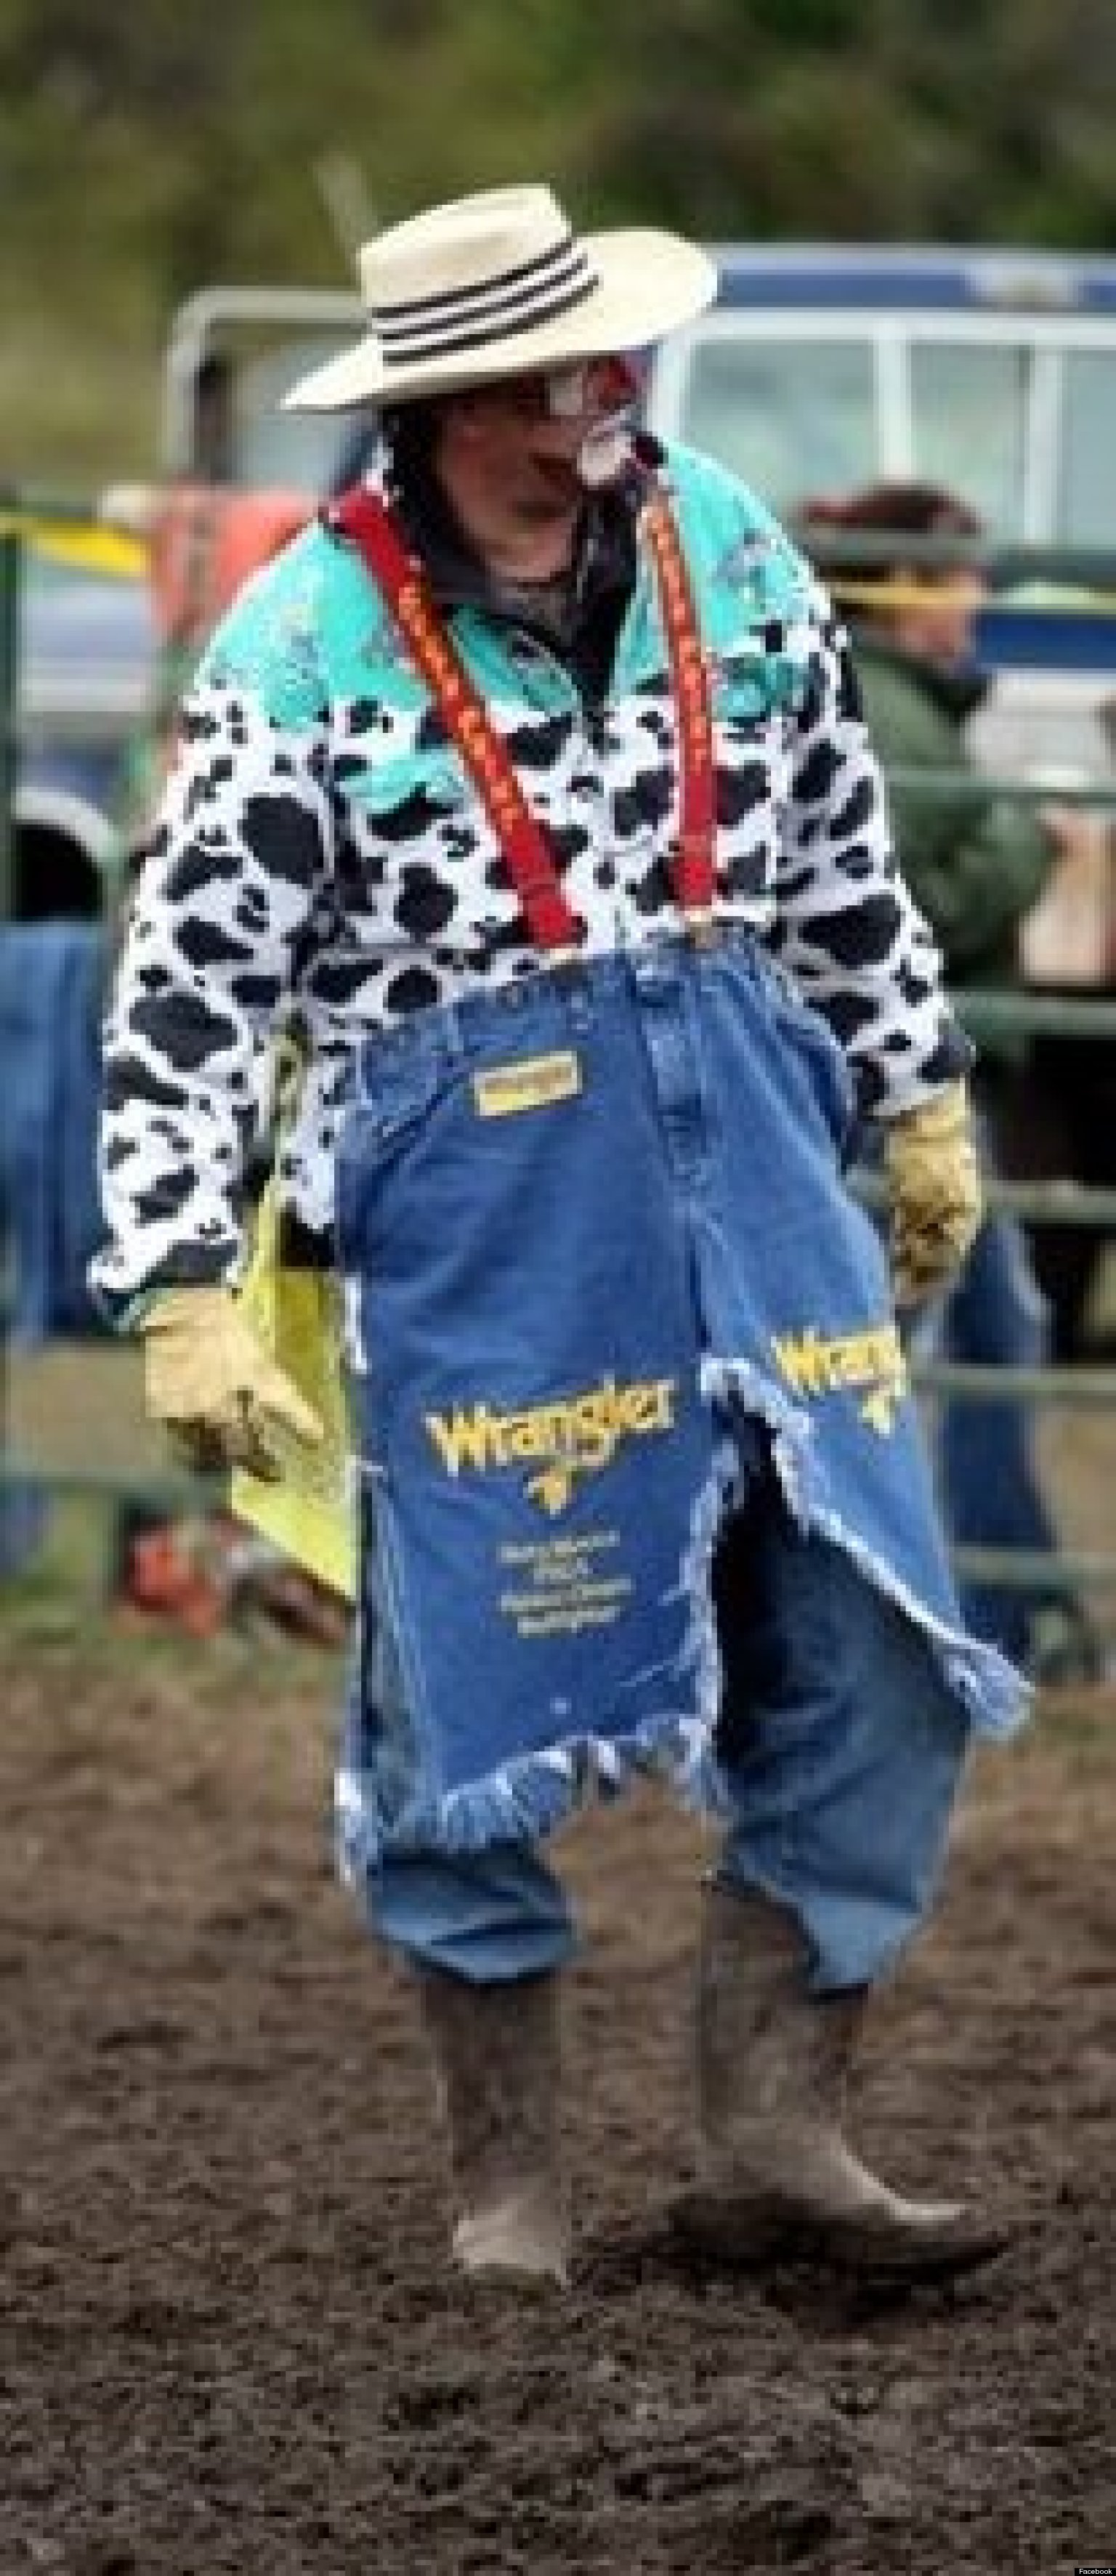 Rory Meeks Rodeo Clown Sentenced To 20 Years In Prison For Growing Marijuana In Iowa Farm Fields | HuffPost & Rory Meeks Rodeo Clown Sentenced To 20 Years In Prison For Growing ...